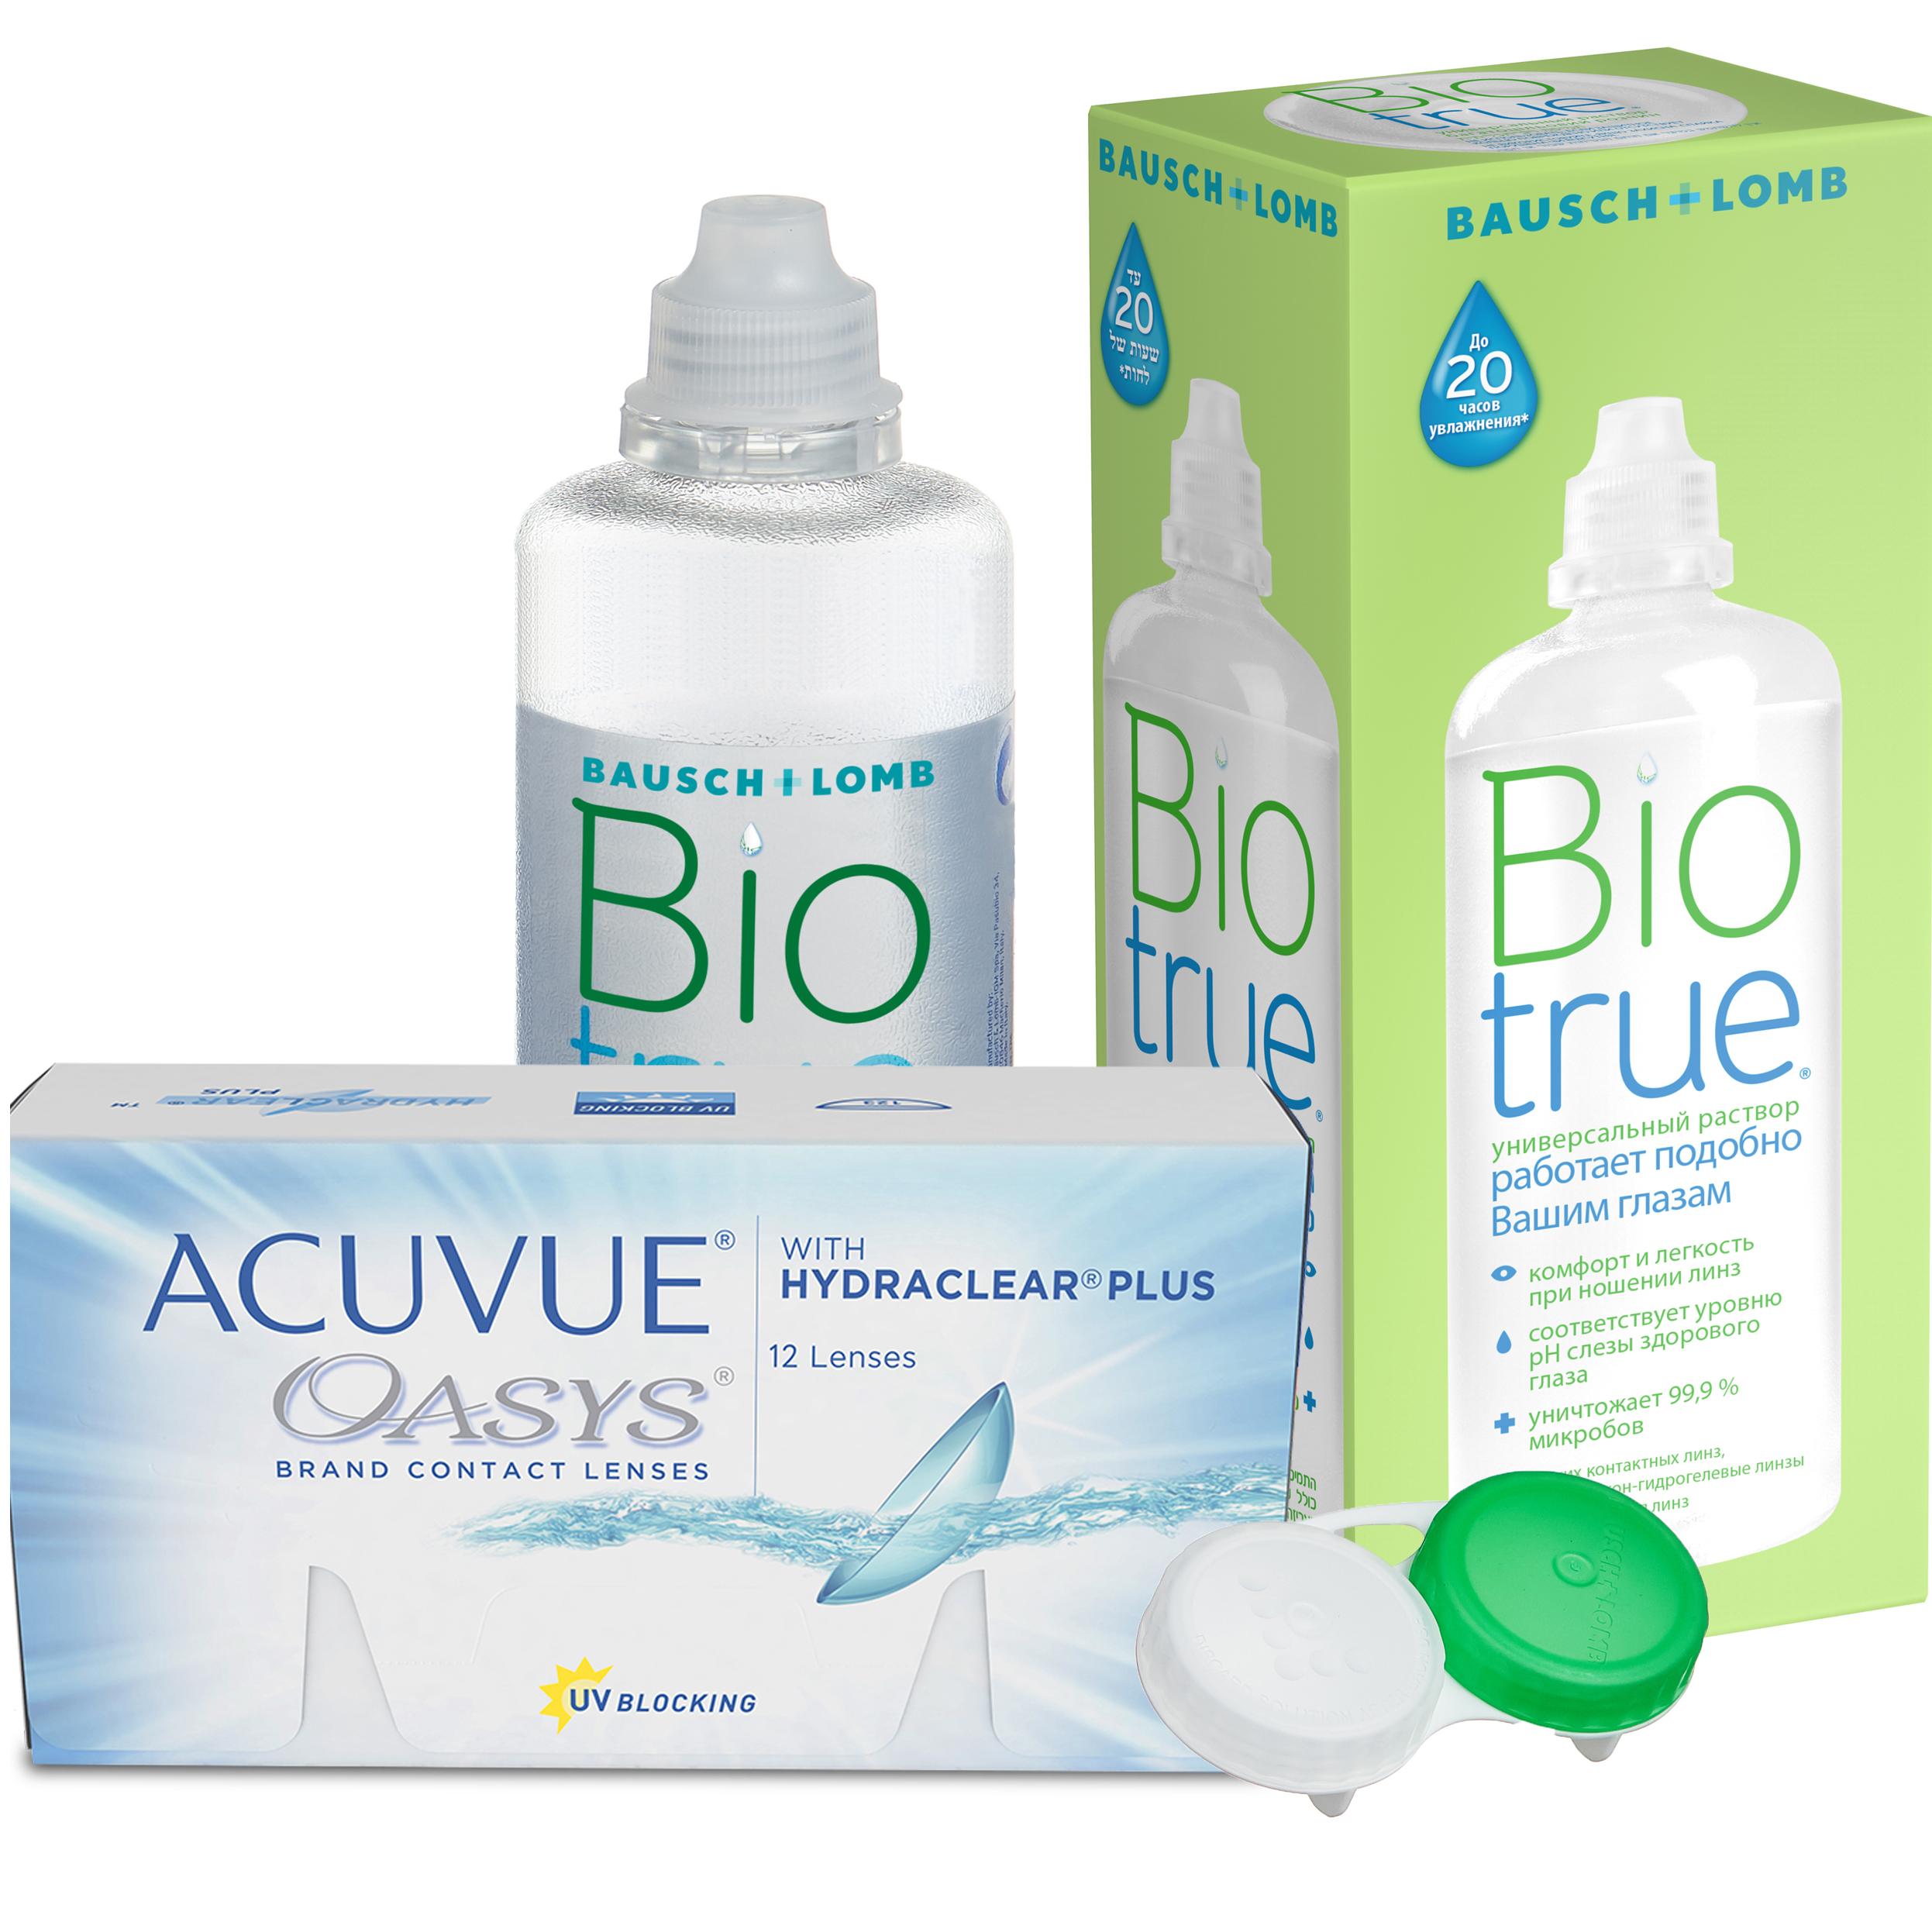 Купить Oasys with Hydraclear Plus 12 линз + Biotrue, Контактные линзы Acuvue Oasys with Hydraclear Plus 12 линз R 8.8 -3, 50 + Biotrue 300 мл